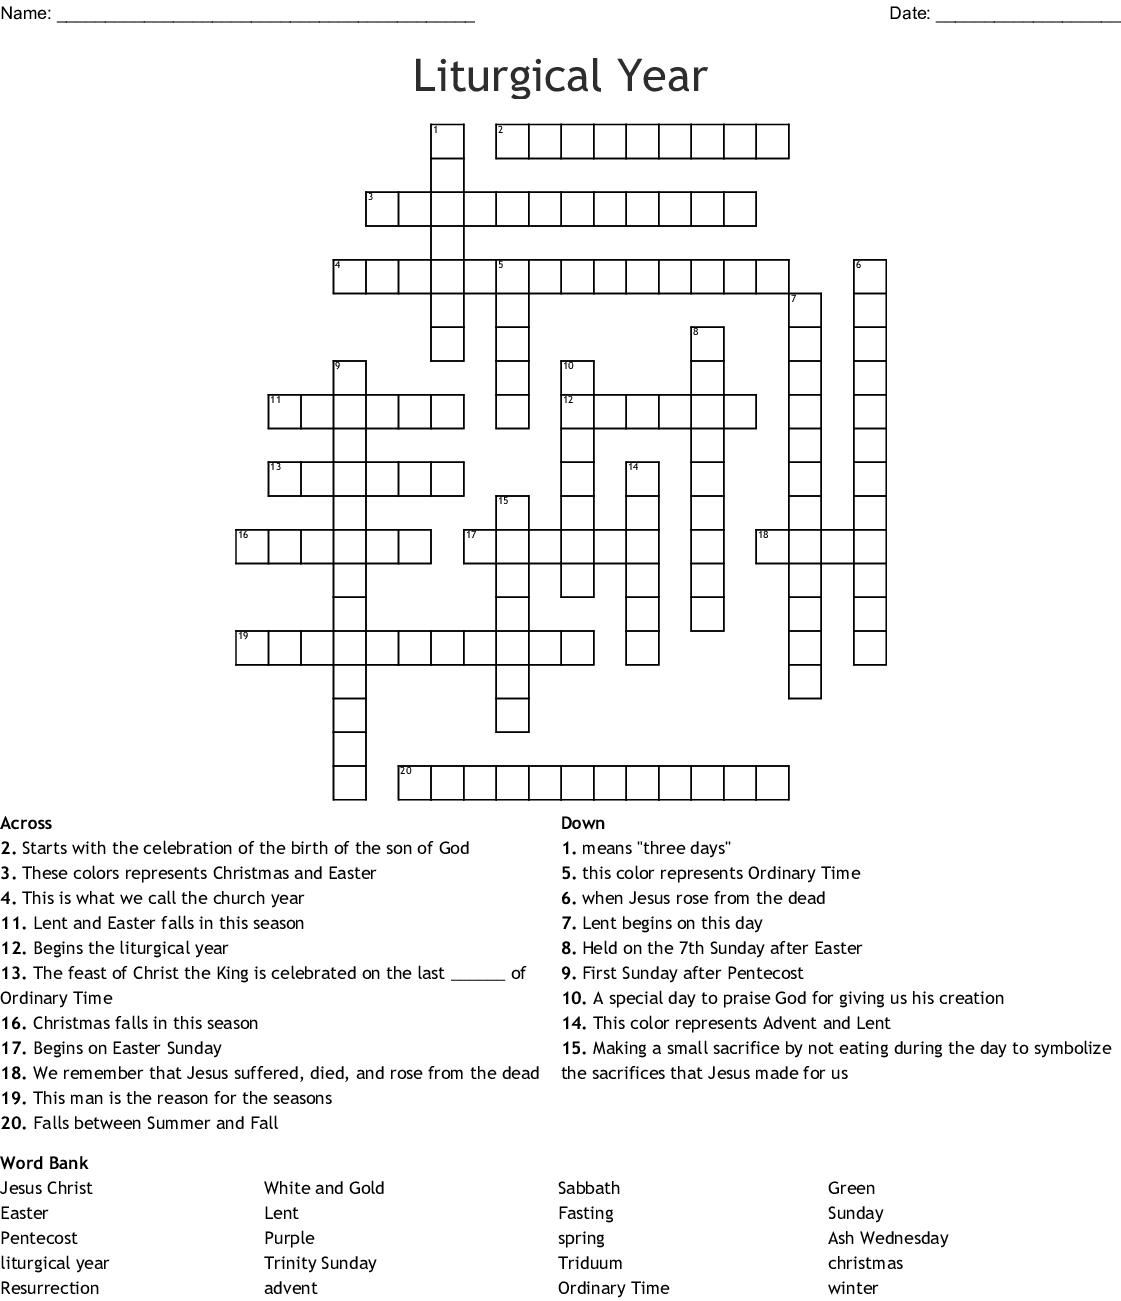 Liturgical Year Crossword